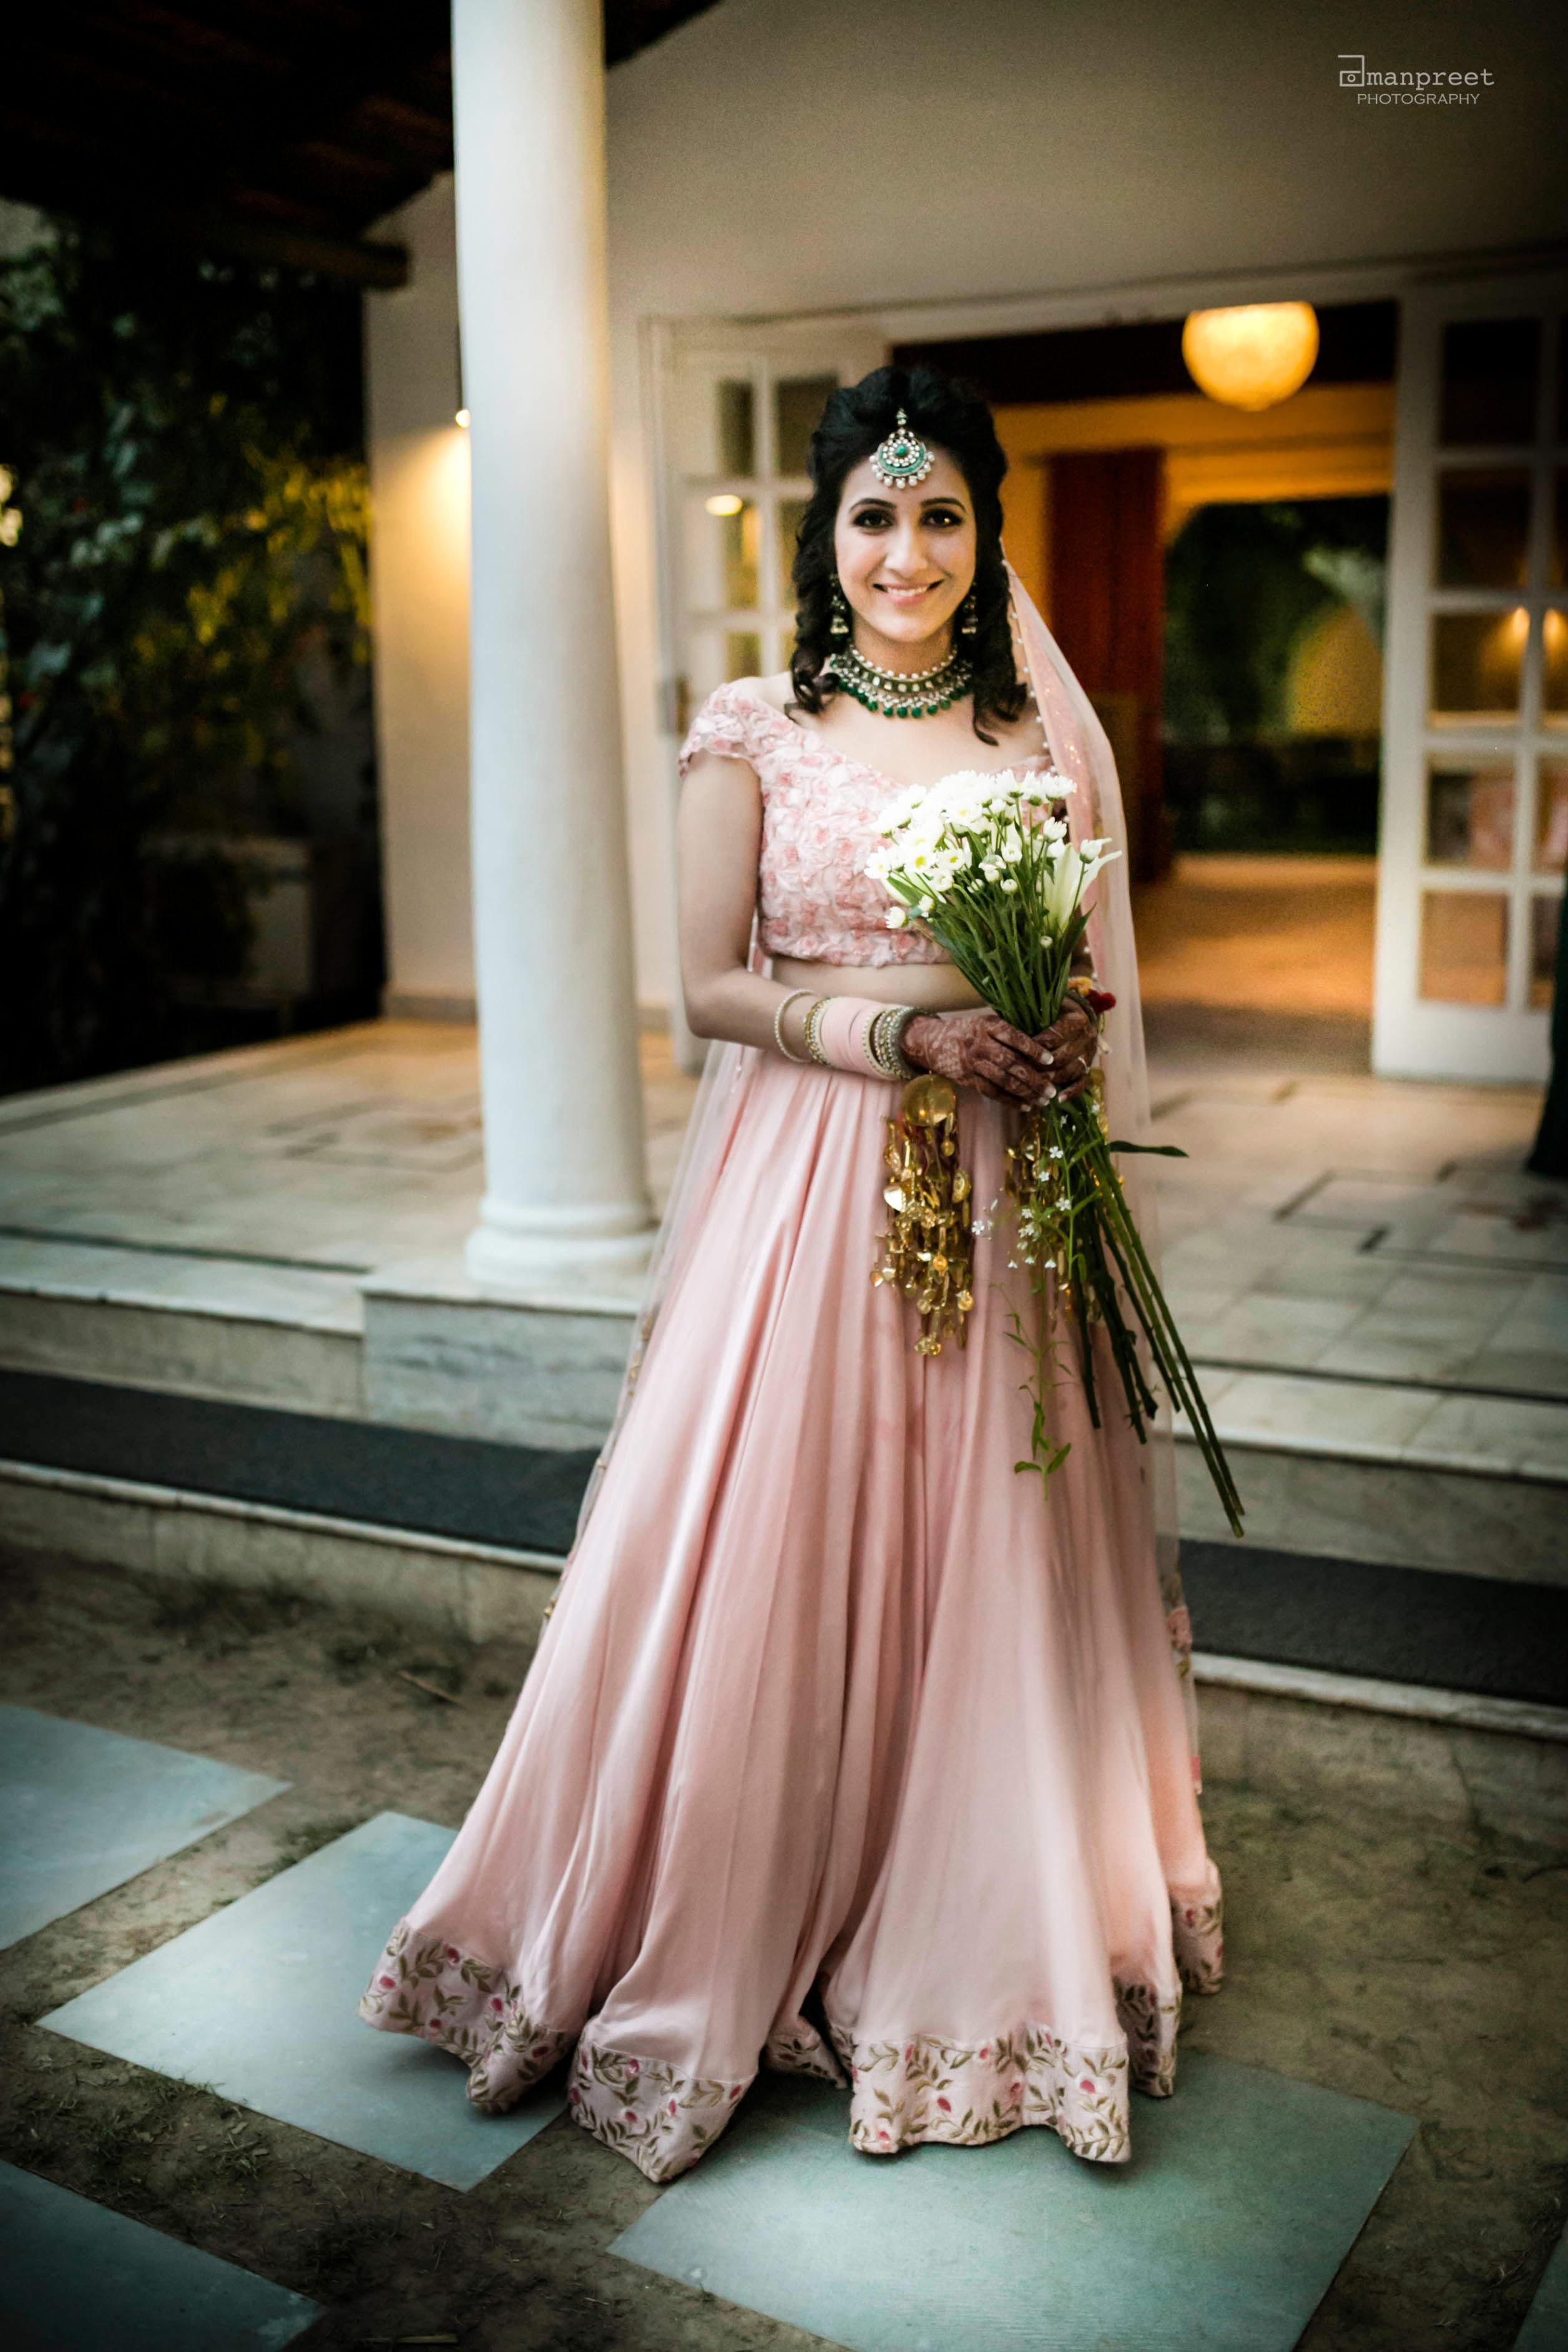 simply ethereal!:geetanjali salon, raju mehandi wala, amanpreet photography, ole couture